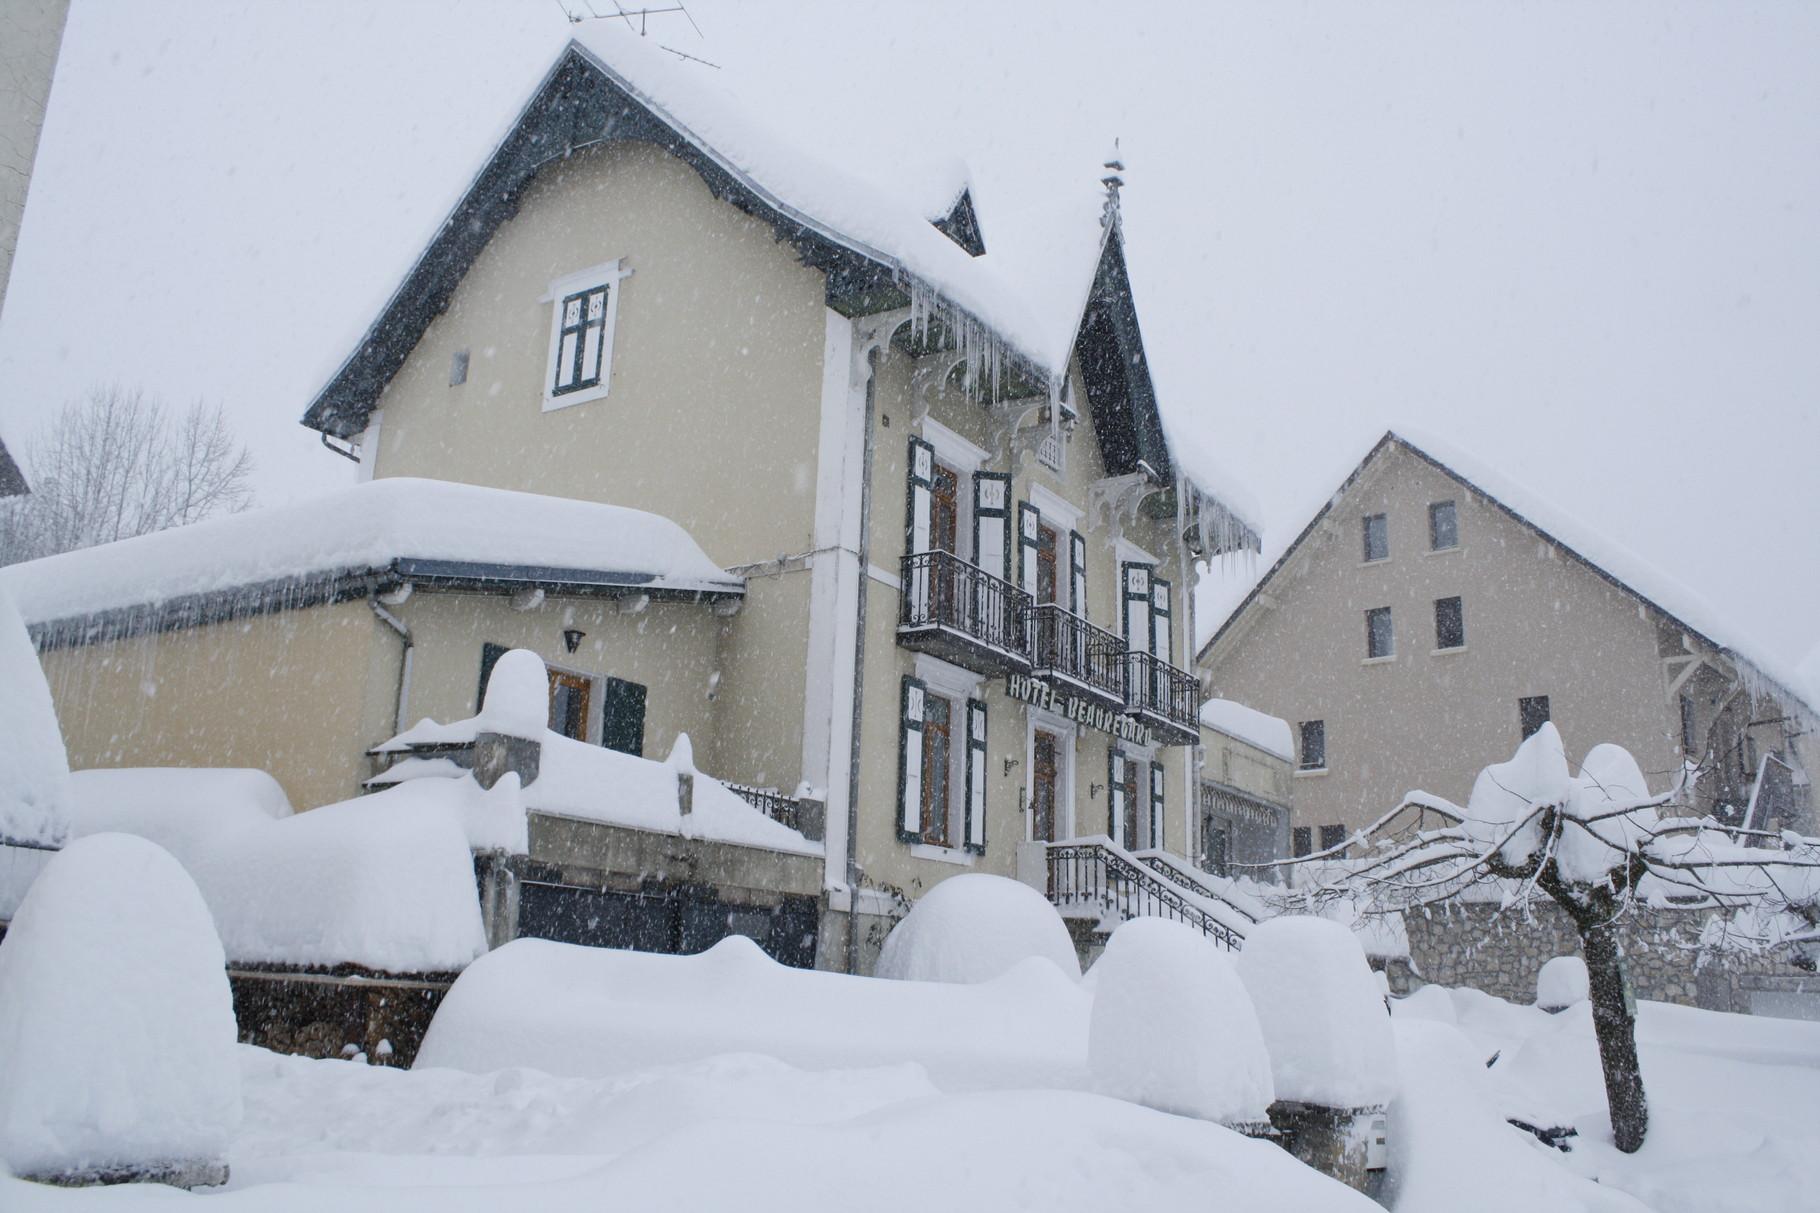 sous la neige en février 2015